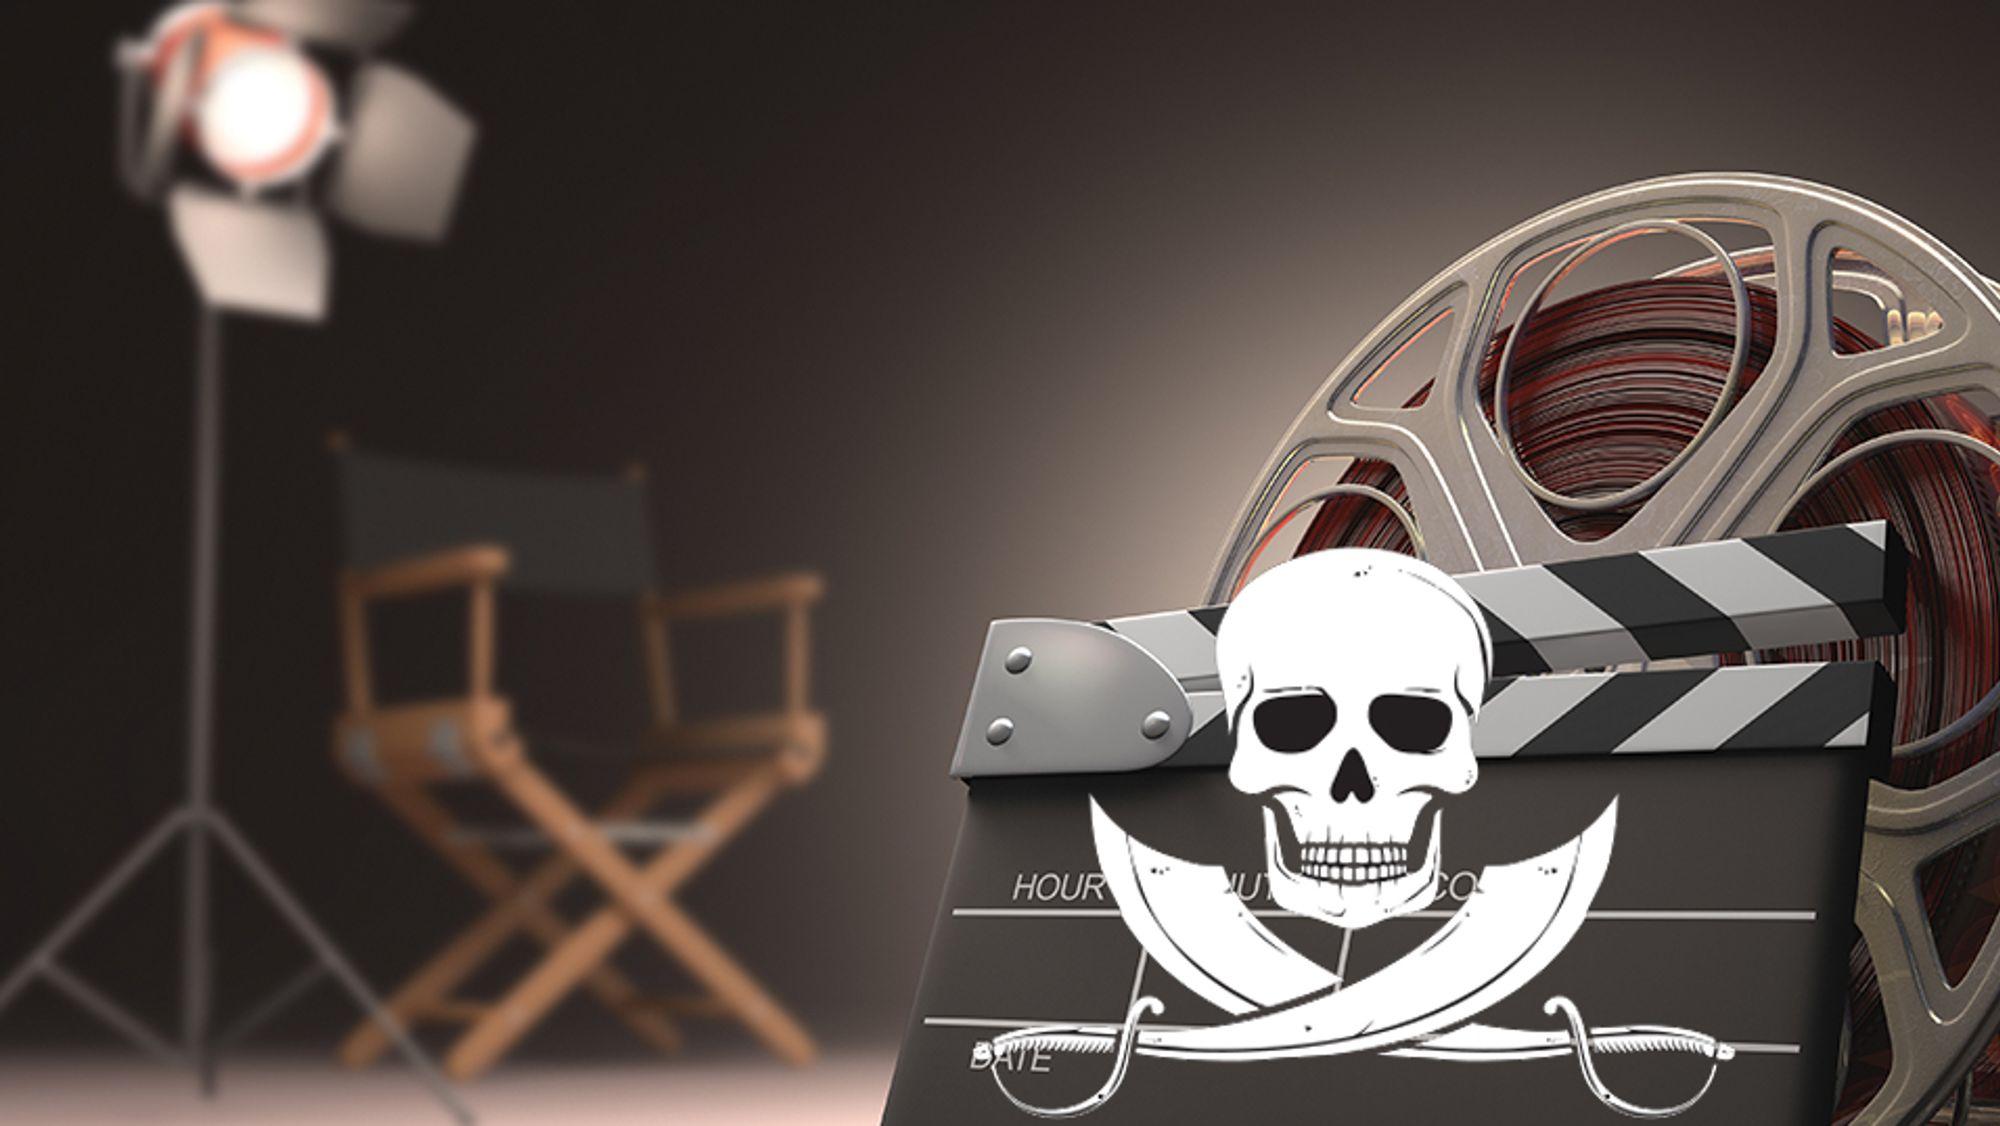 Selv filmskaperne piratkopierer